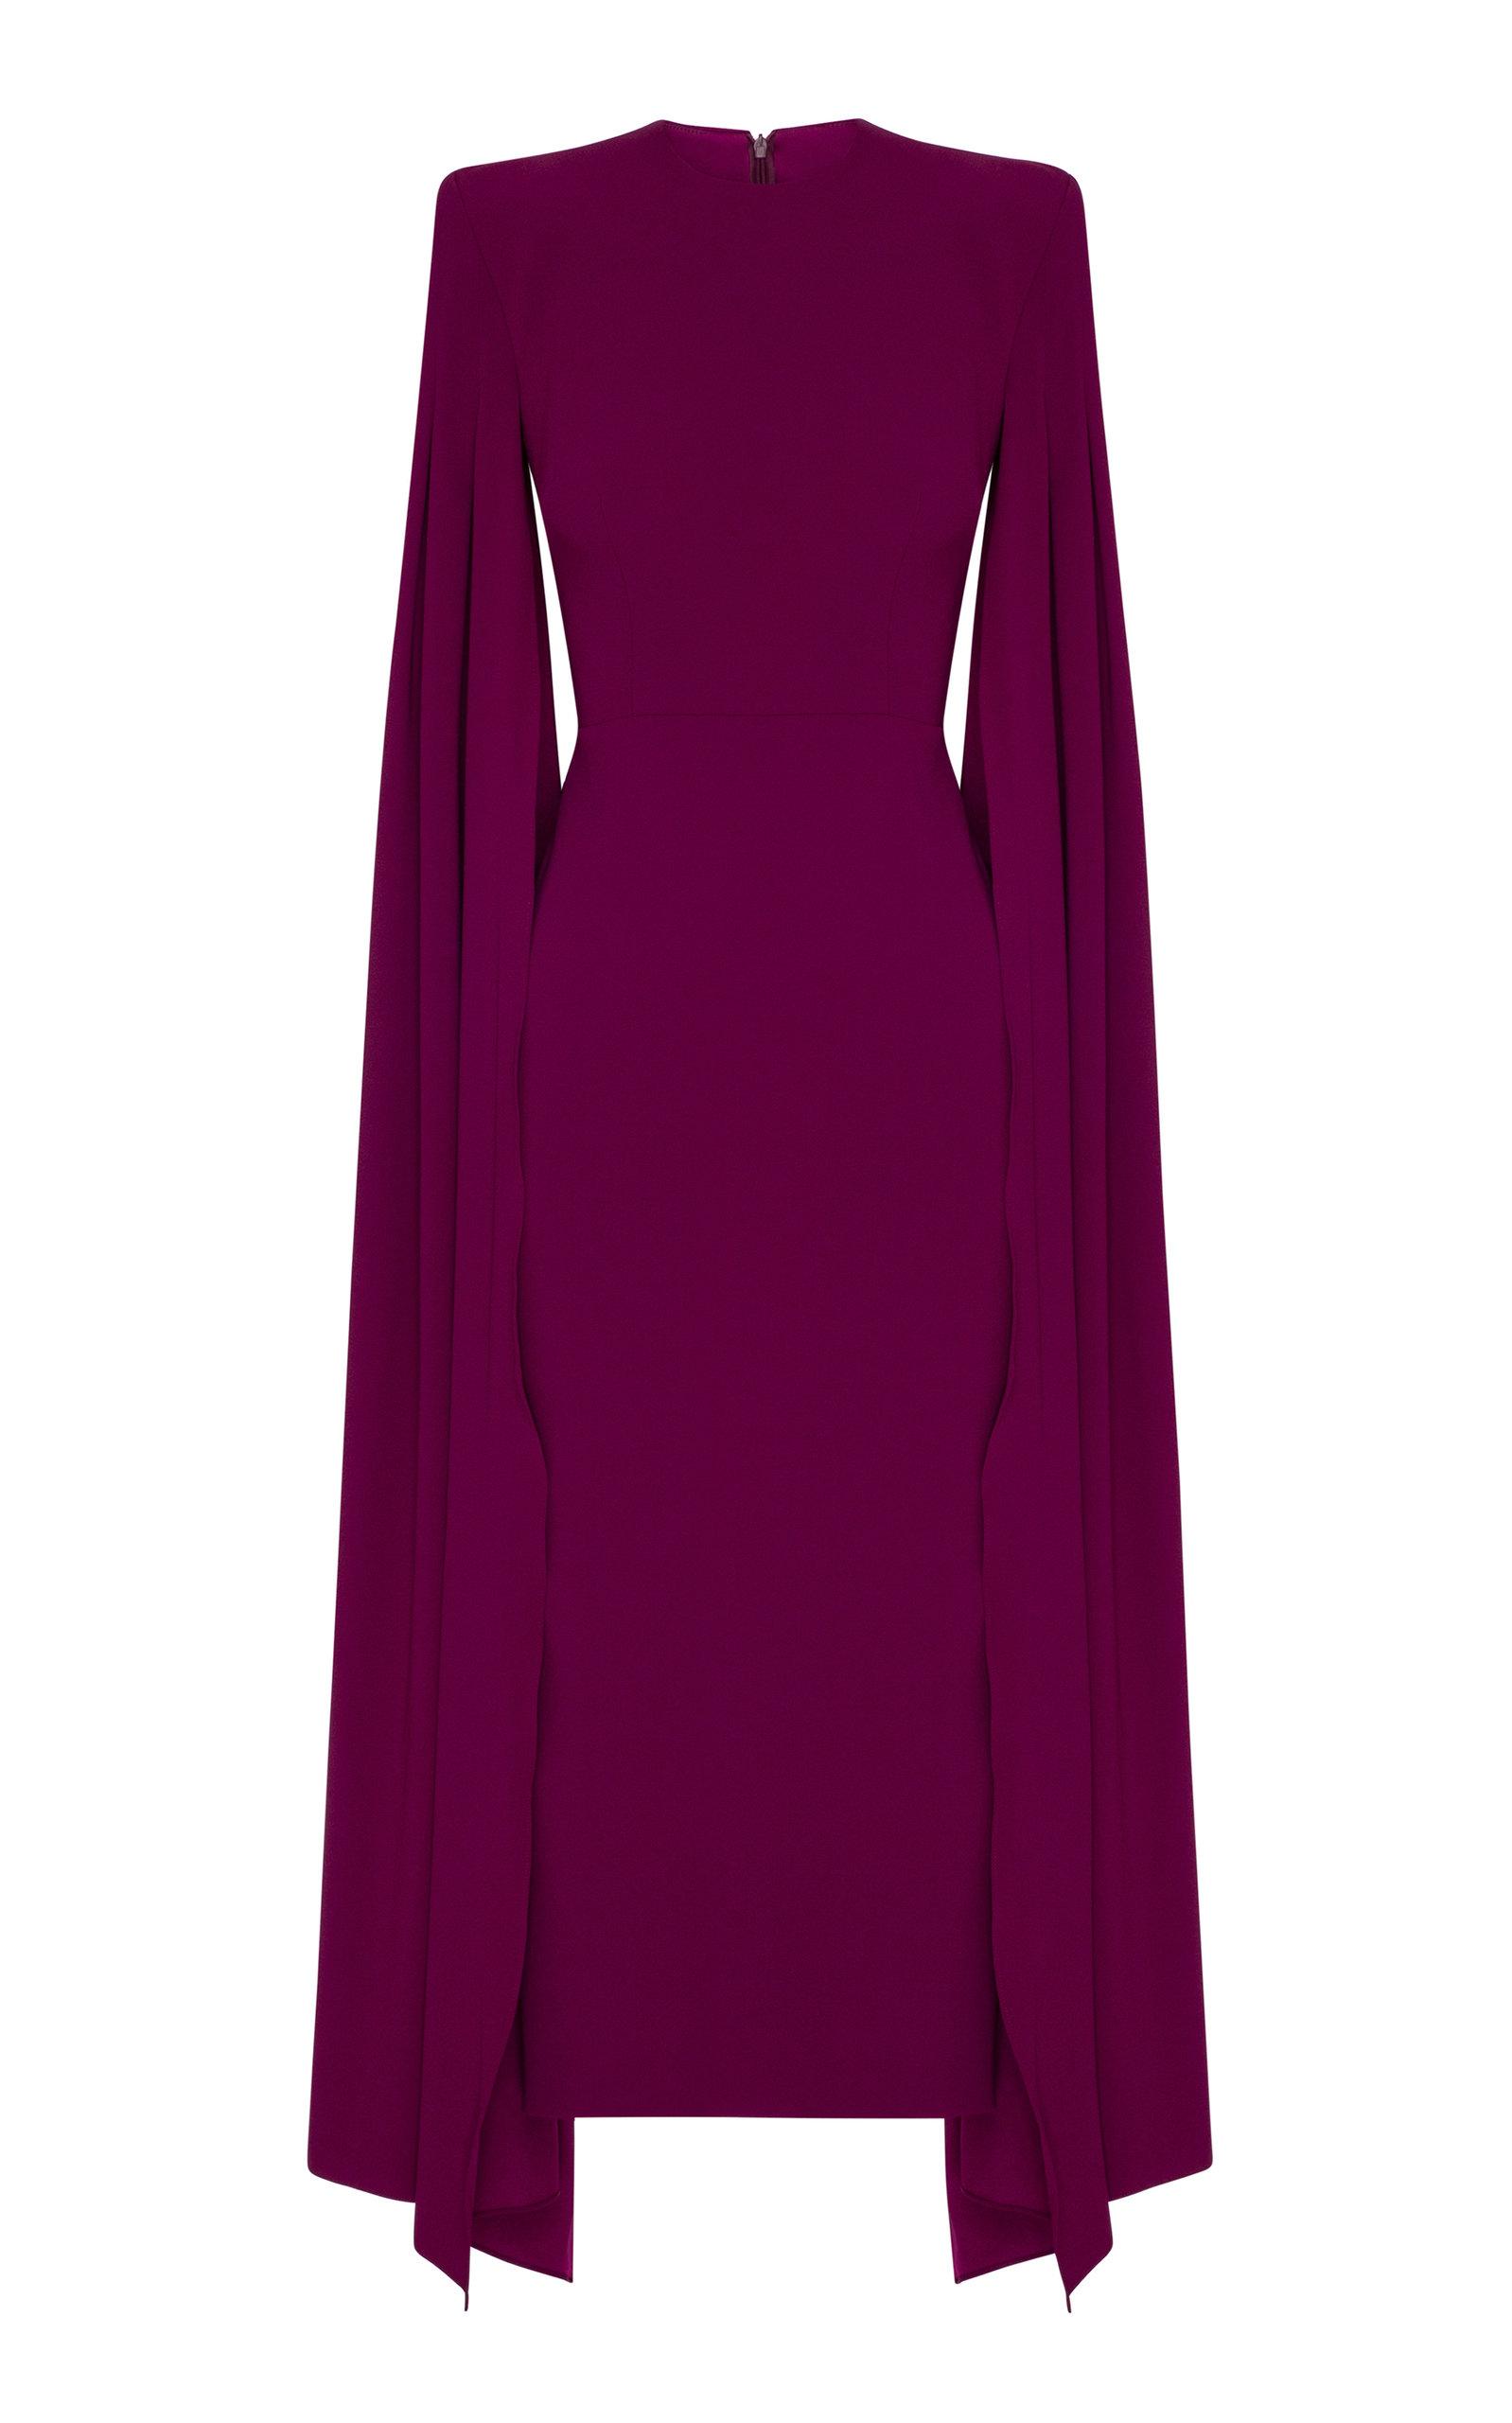 Women's Kennedy Satin-Crepe Cape Dress